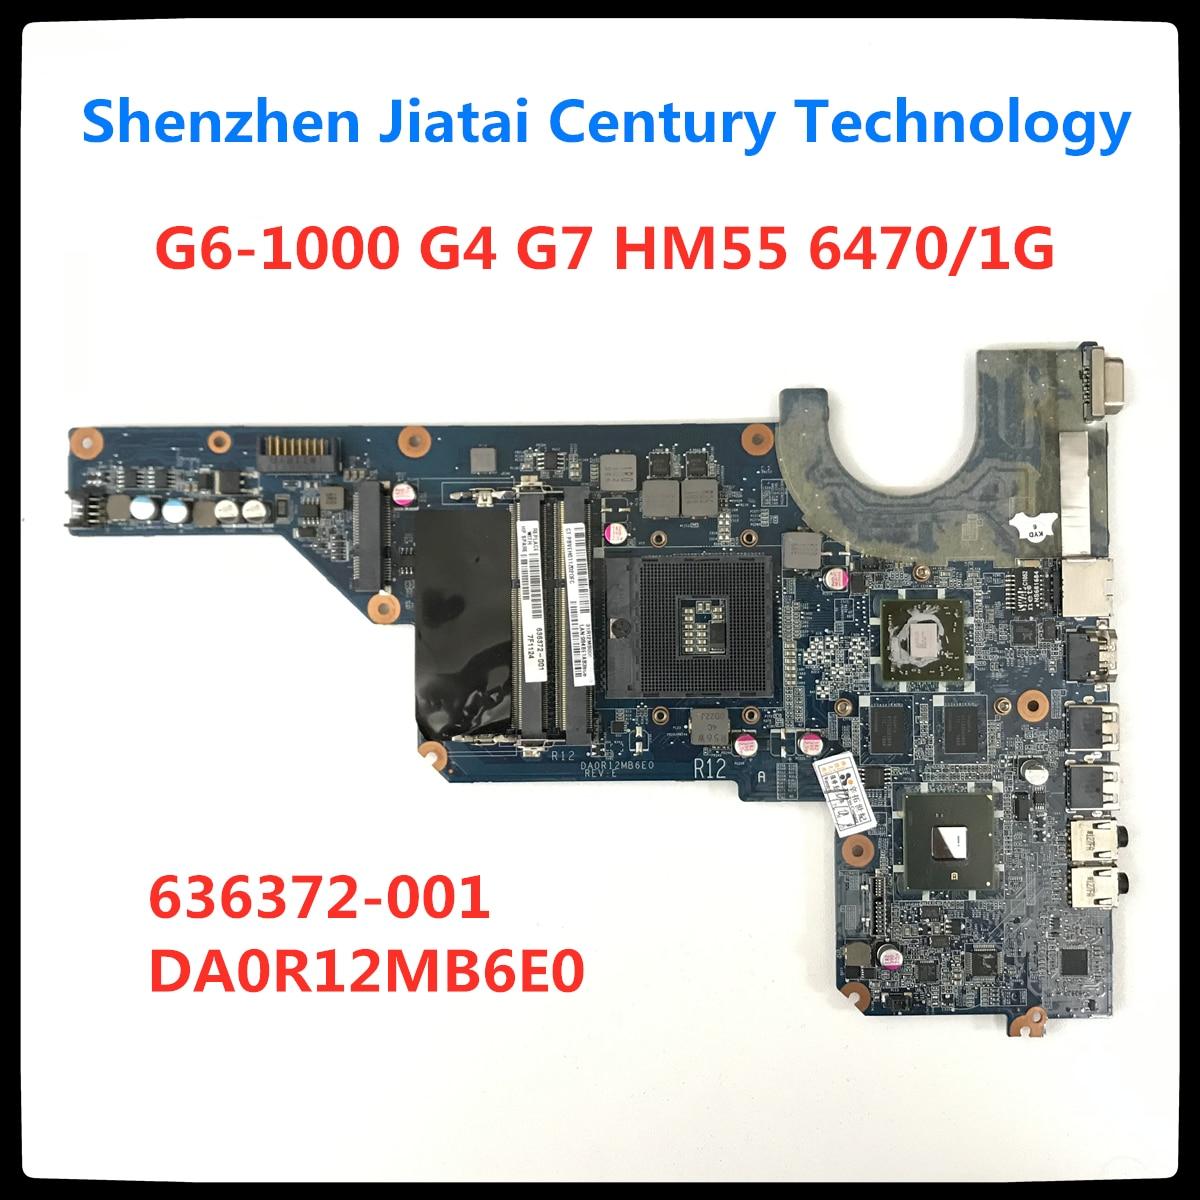 Ücretsiz kargo 636372-001 HP Pavilion G6-1000 G4 G7 laptop anakart HM55 6470/1G DA0R12MB6E0 DA0R12MB6E1